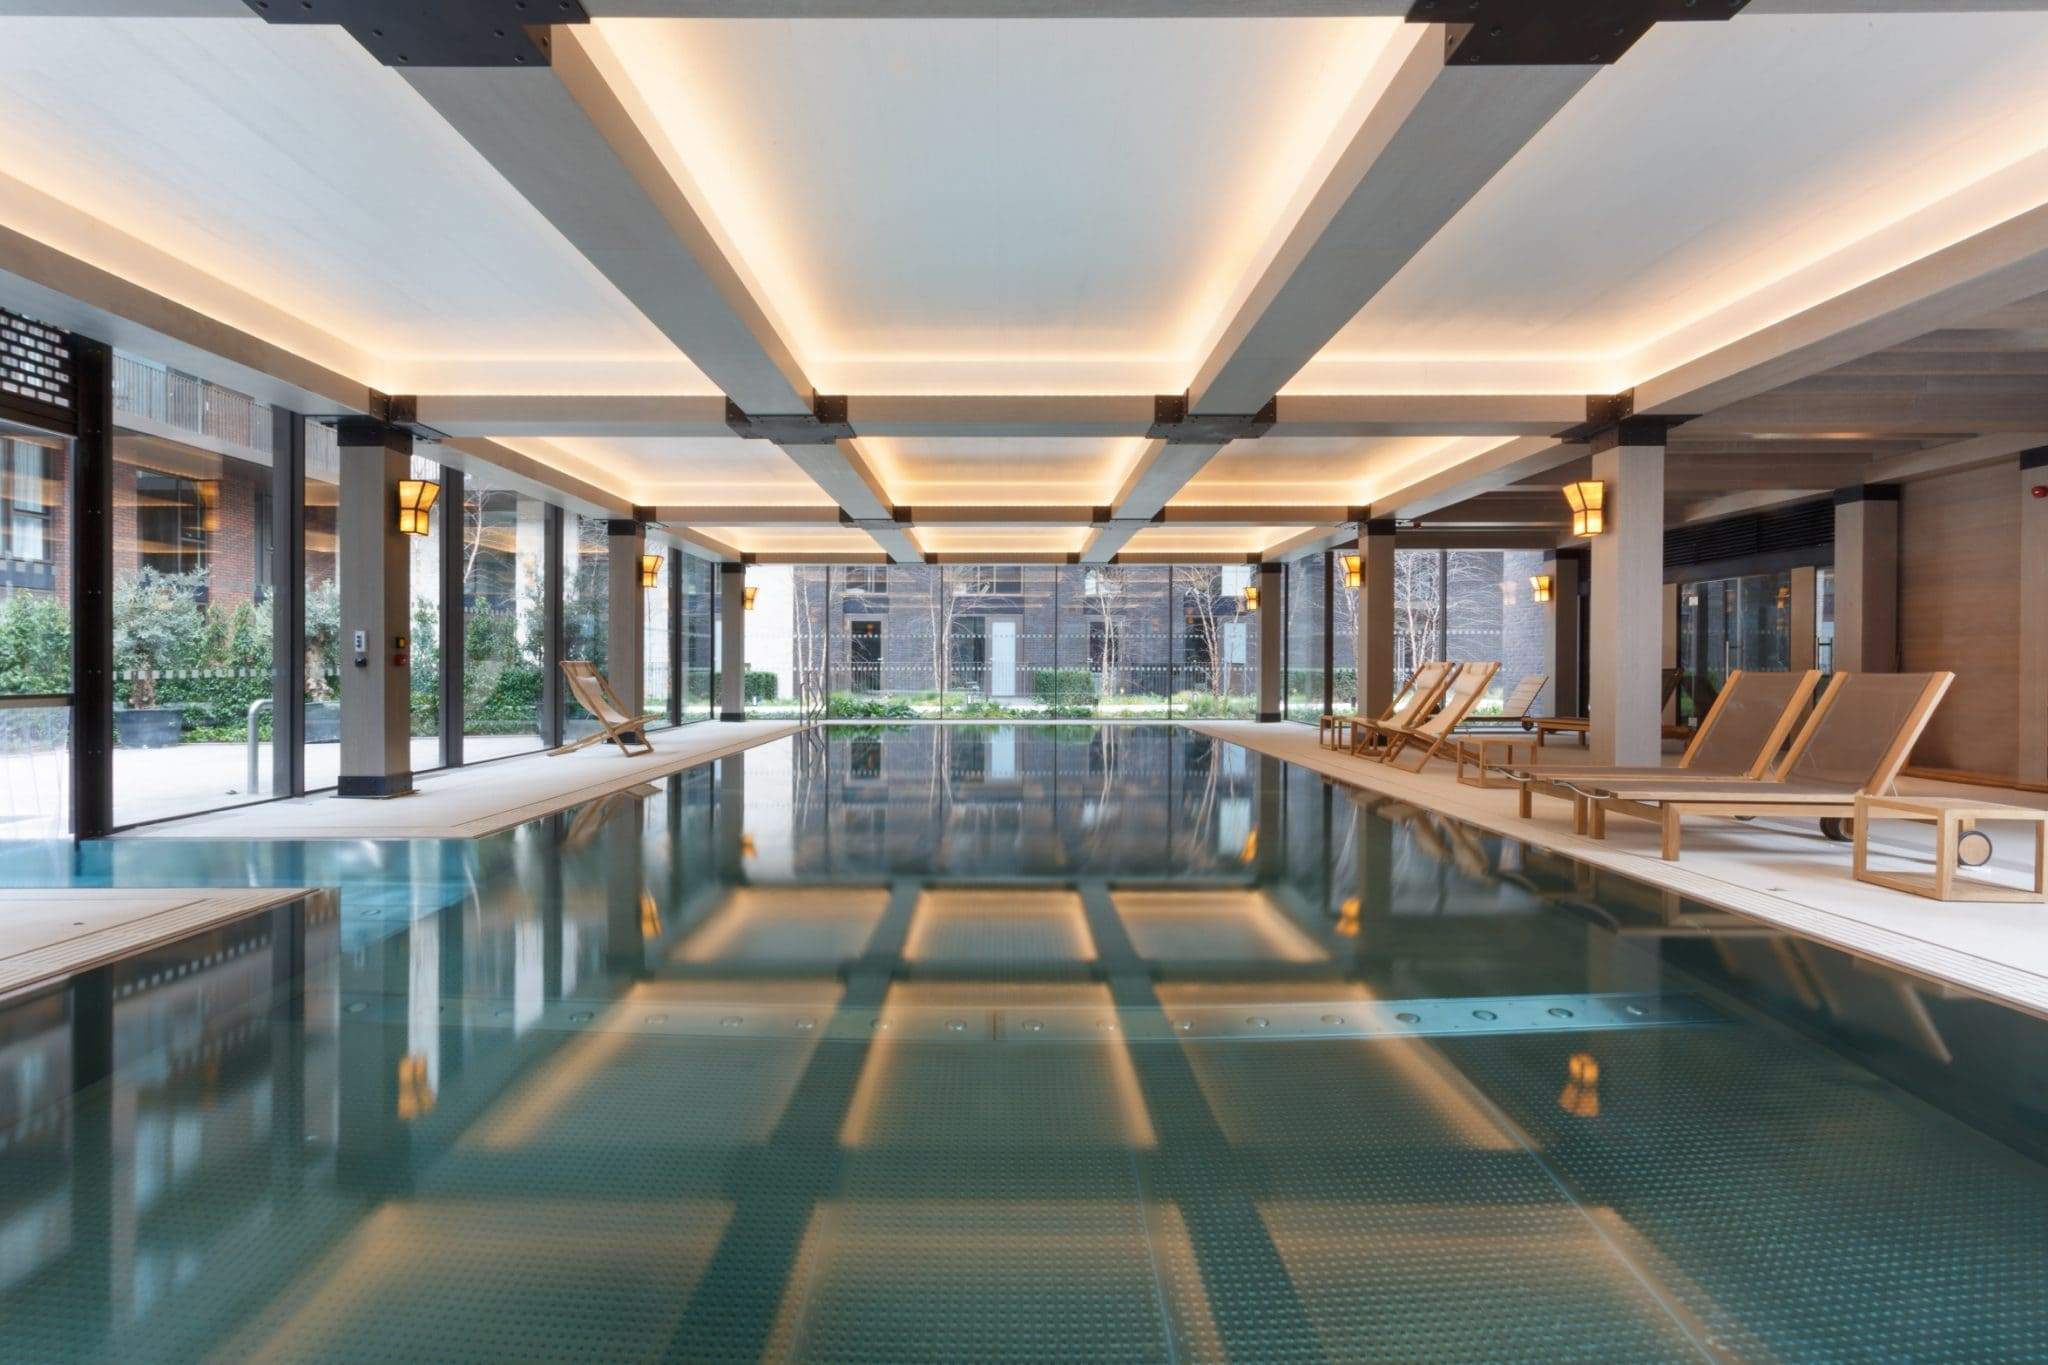 minimal windows interior of swimming pool